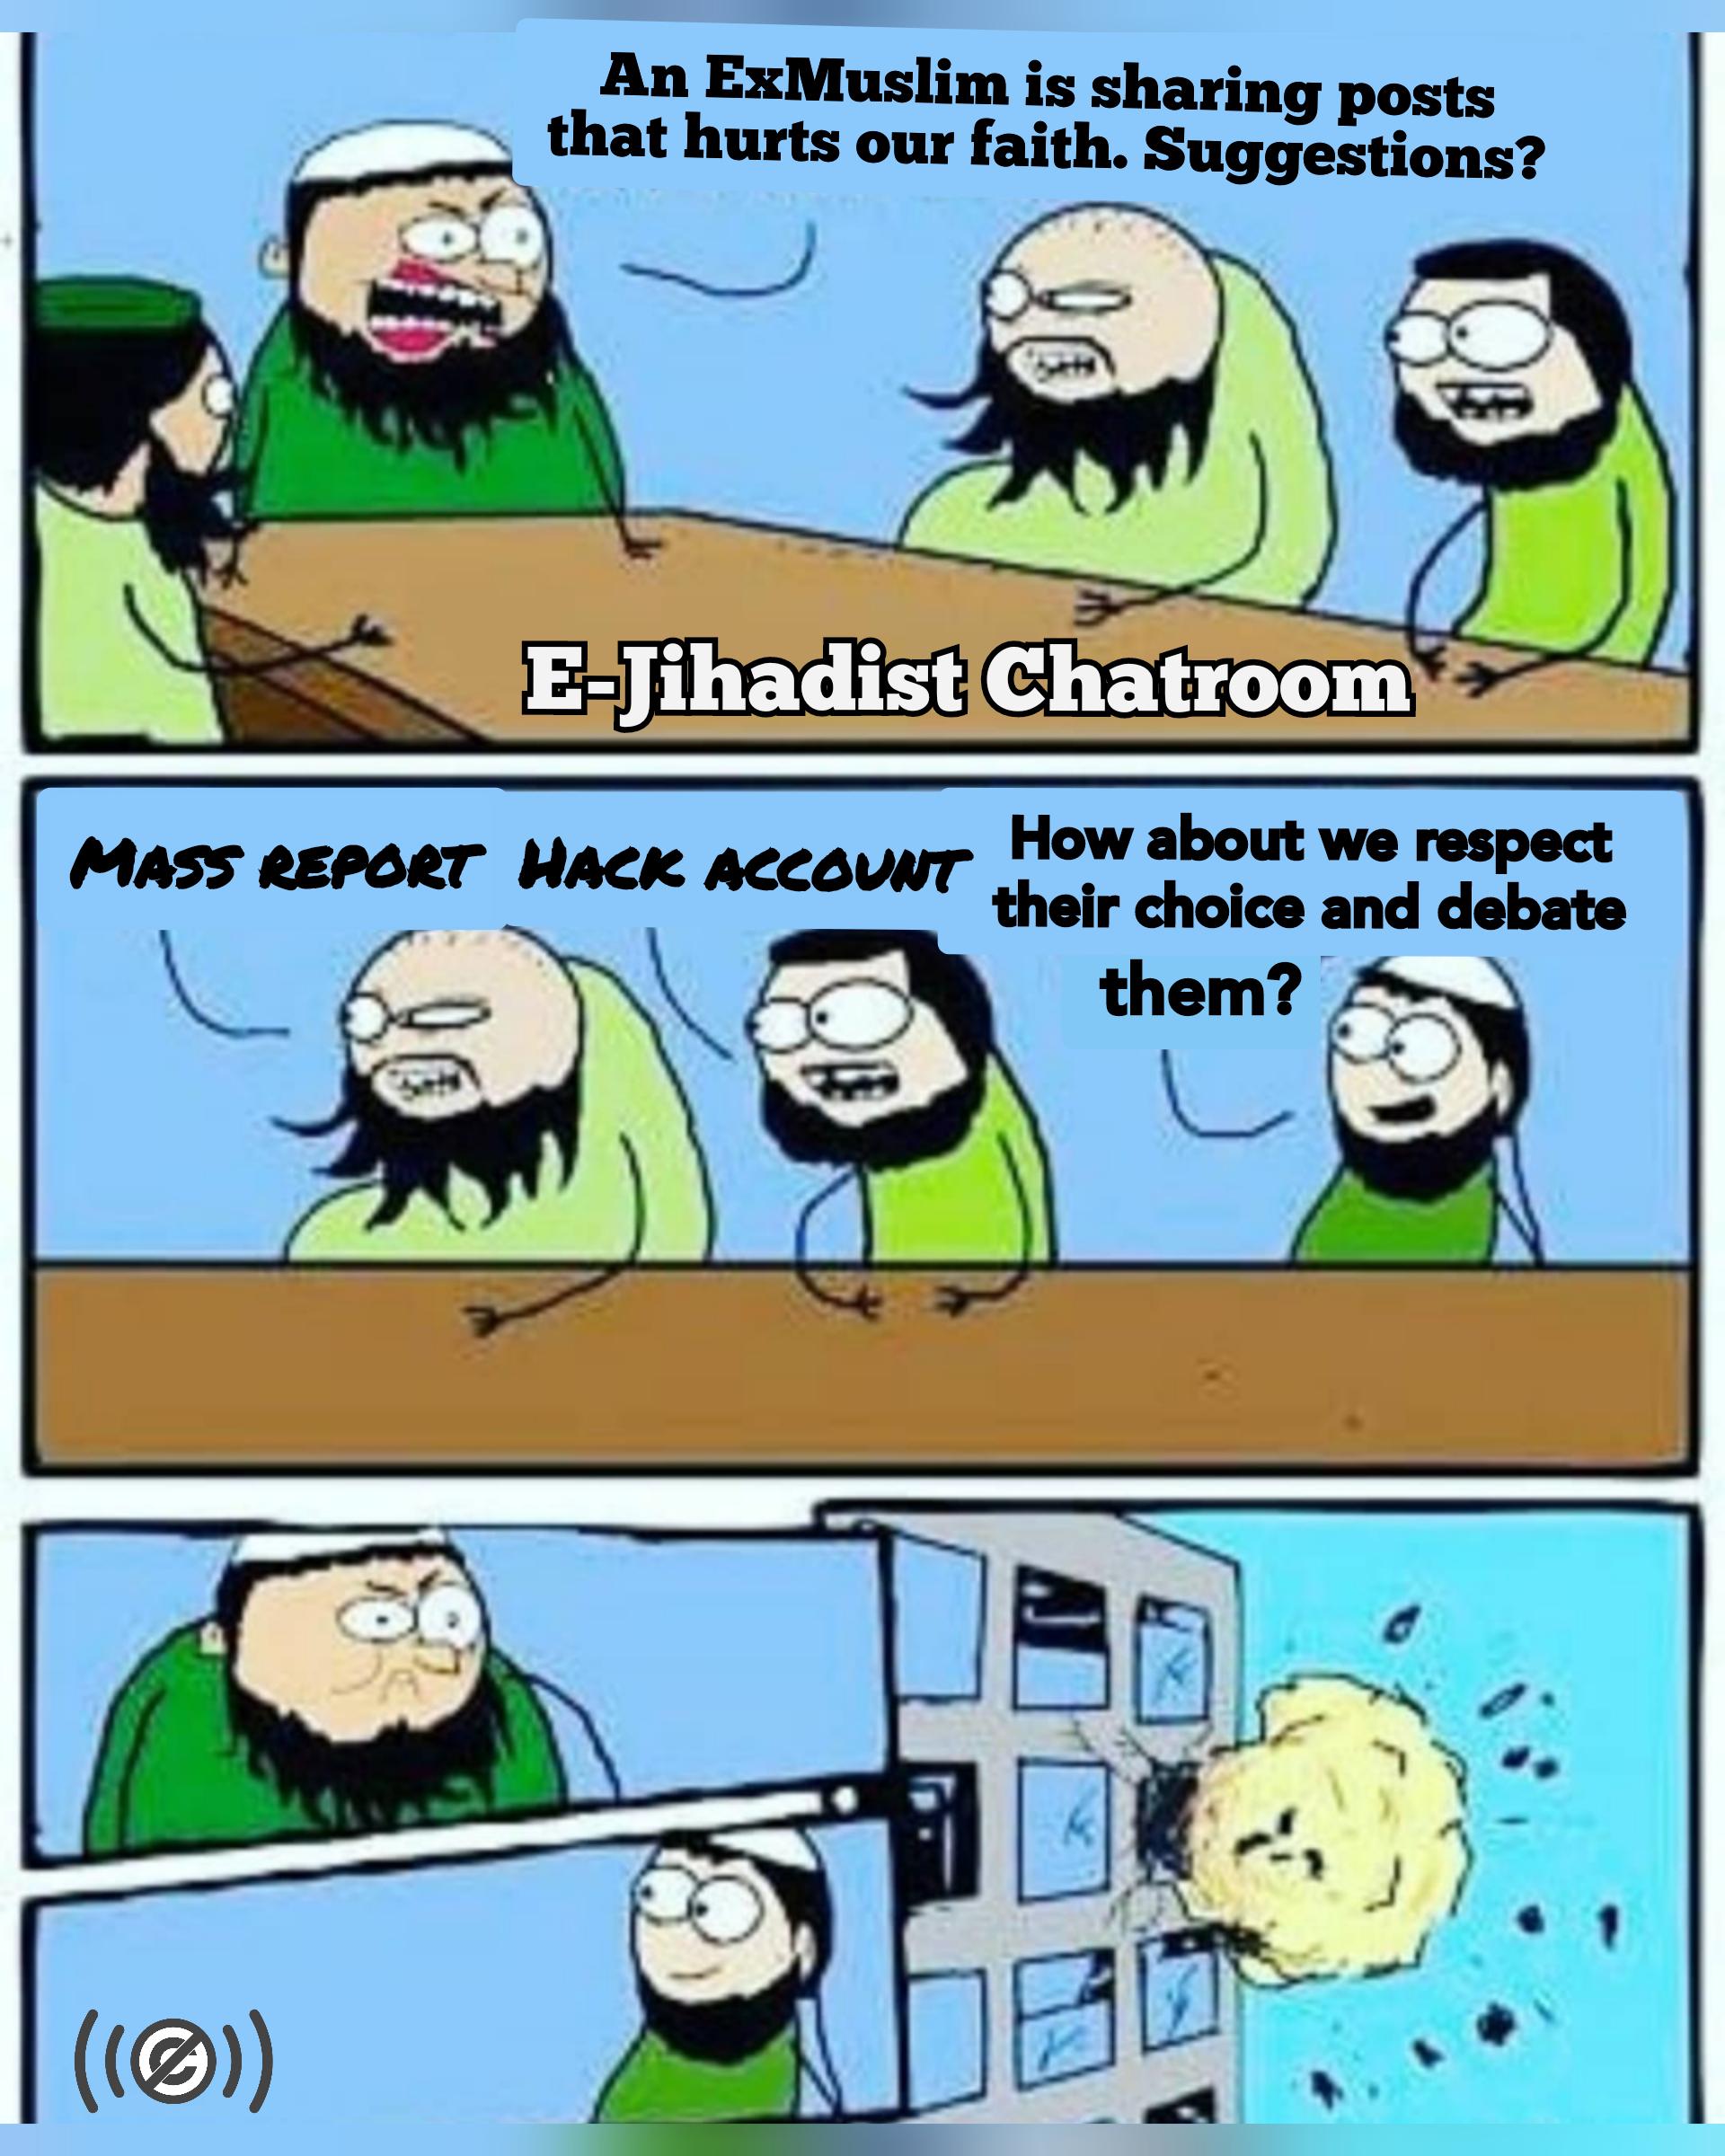 e-jihadists spreading mass reporting